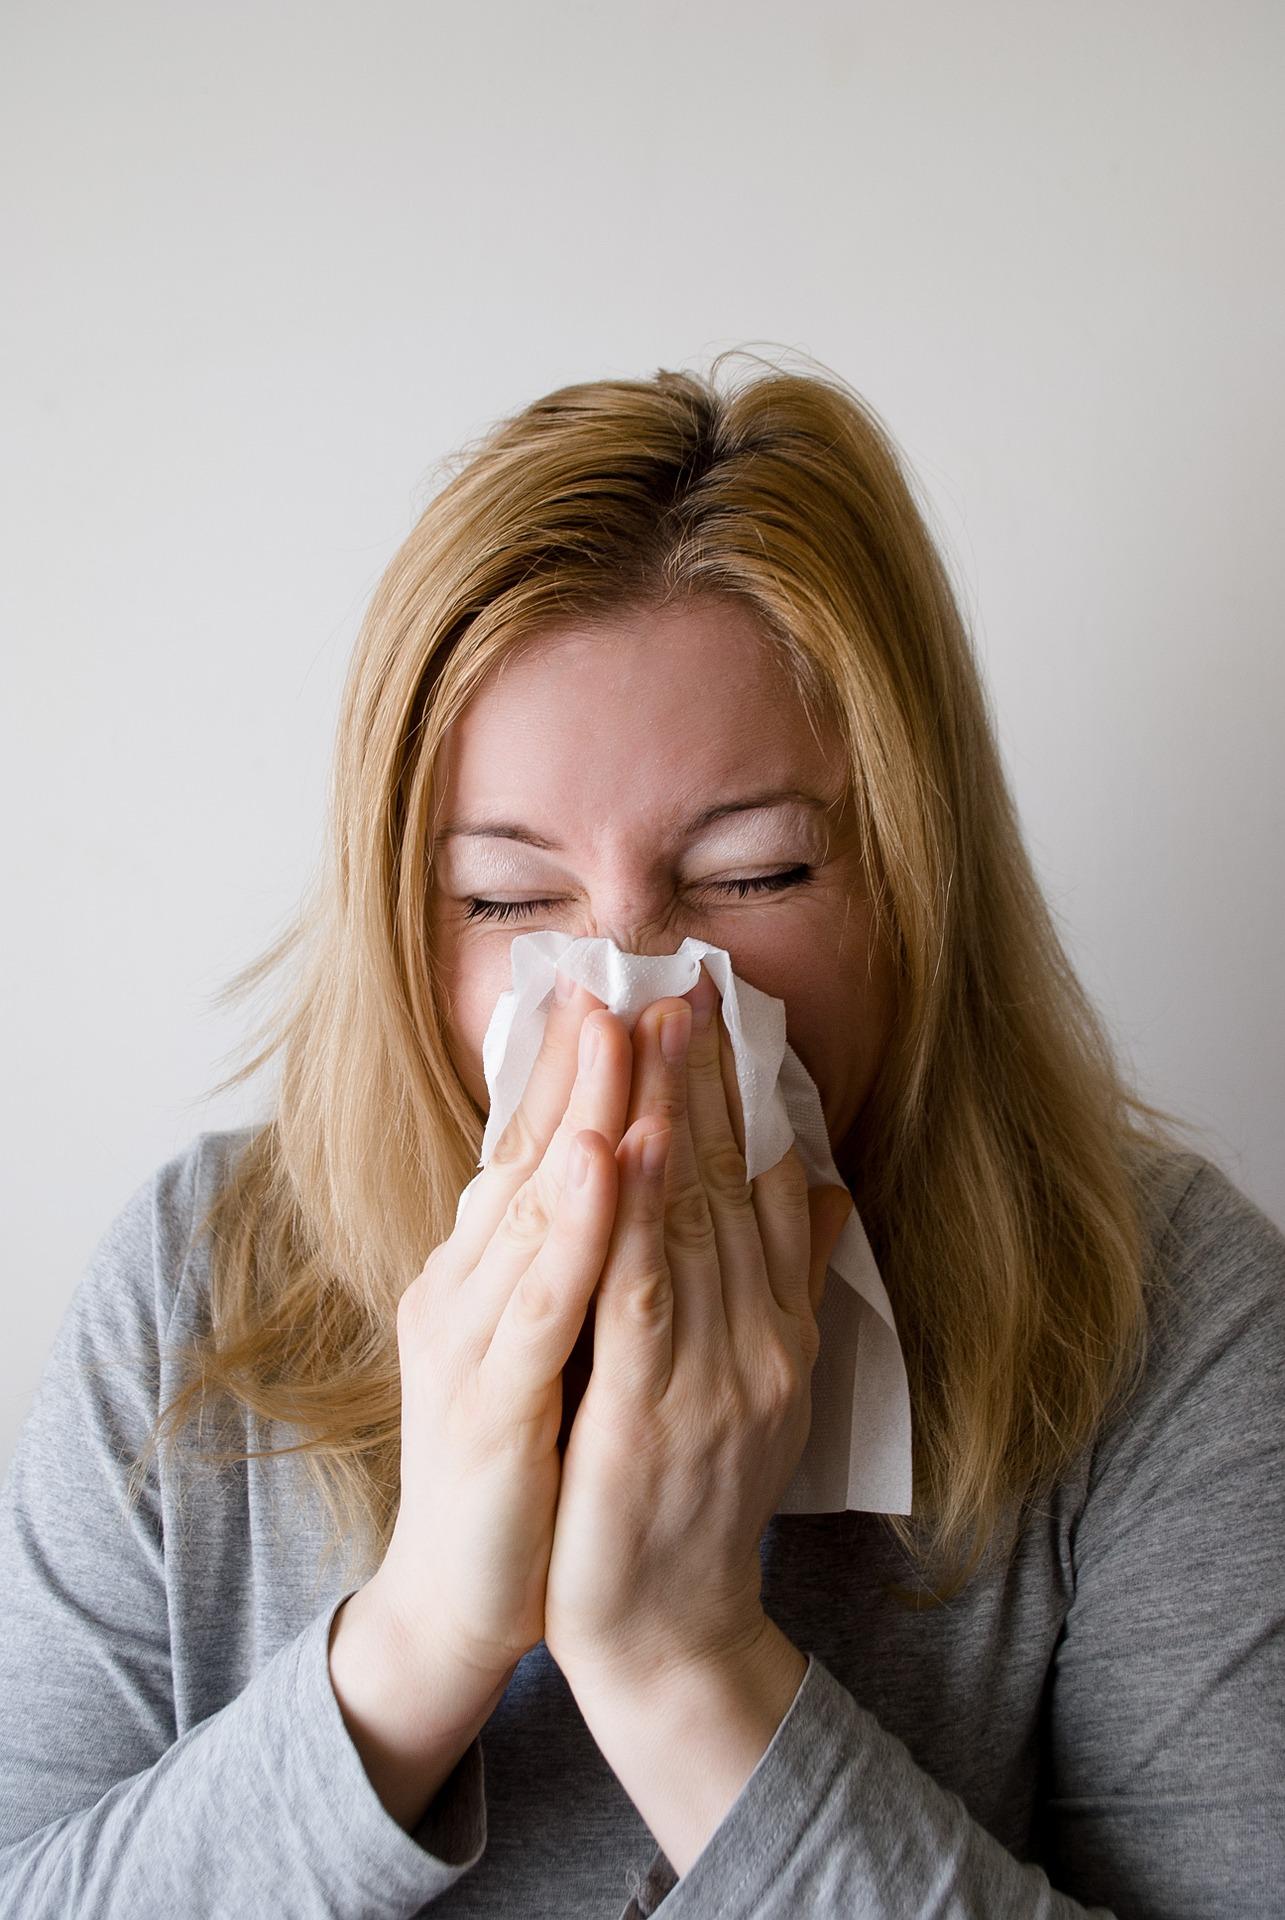 Hausstauballergie Symptome